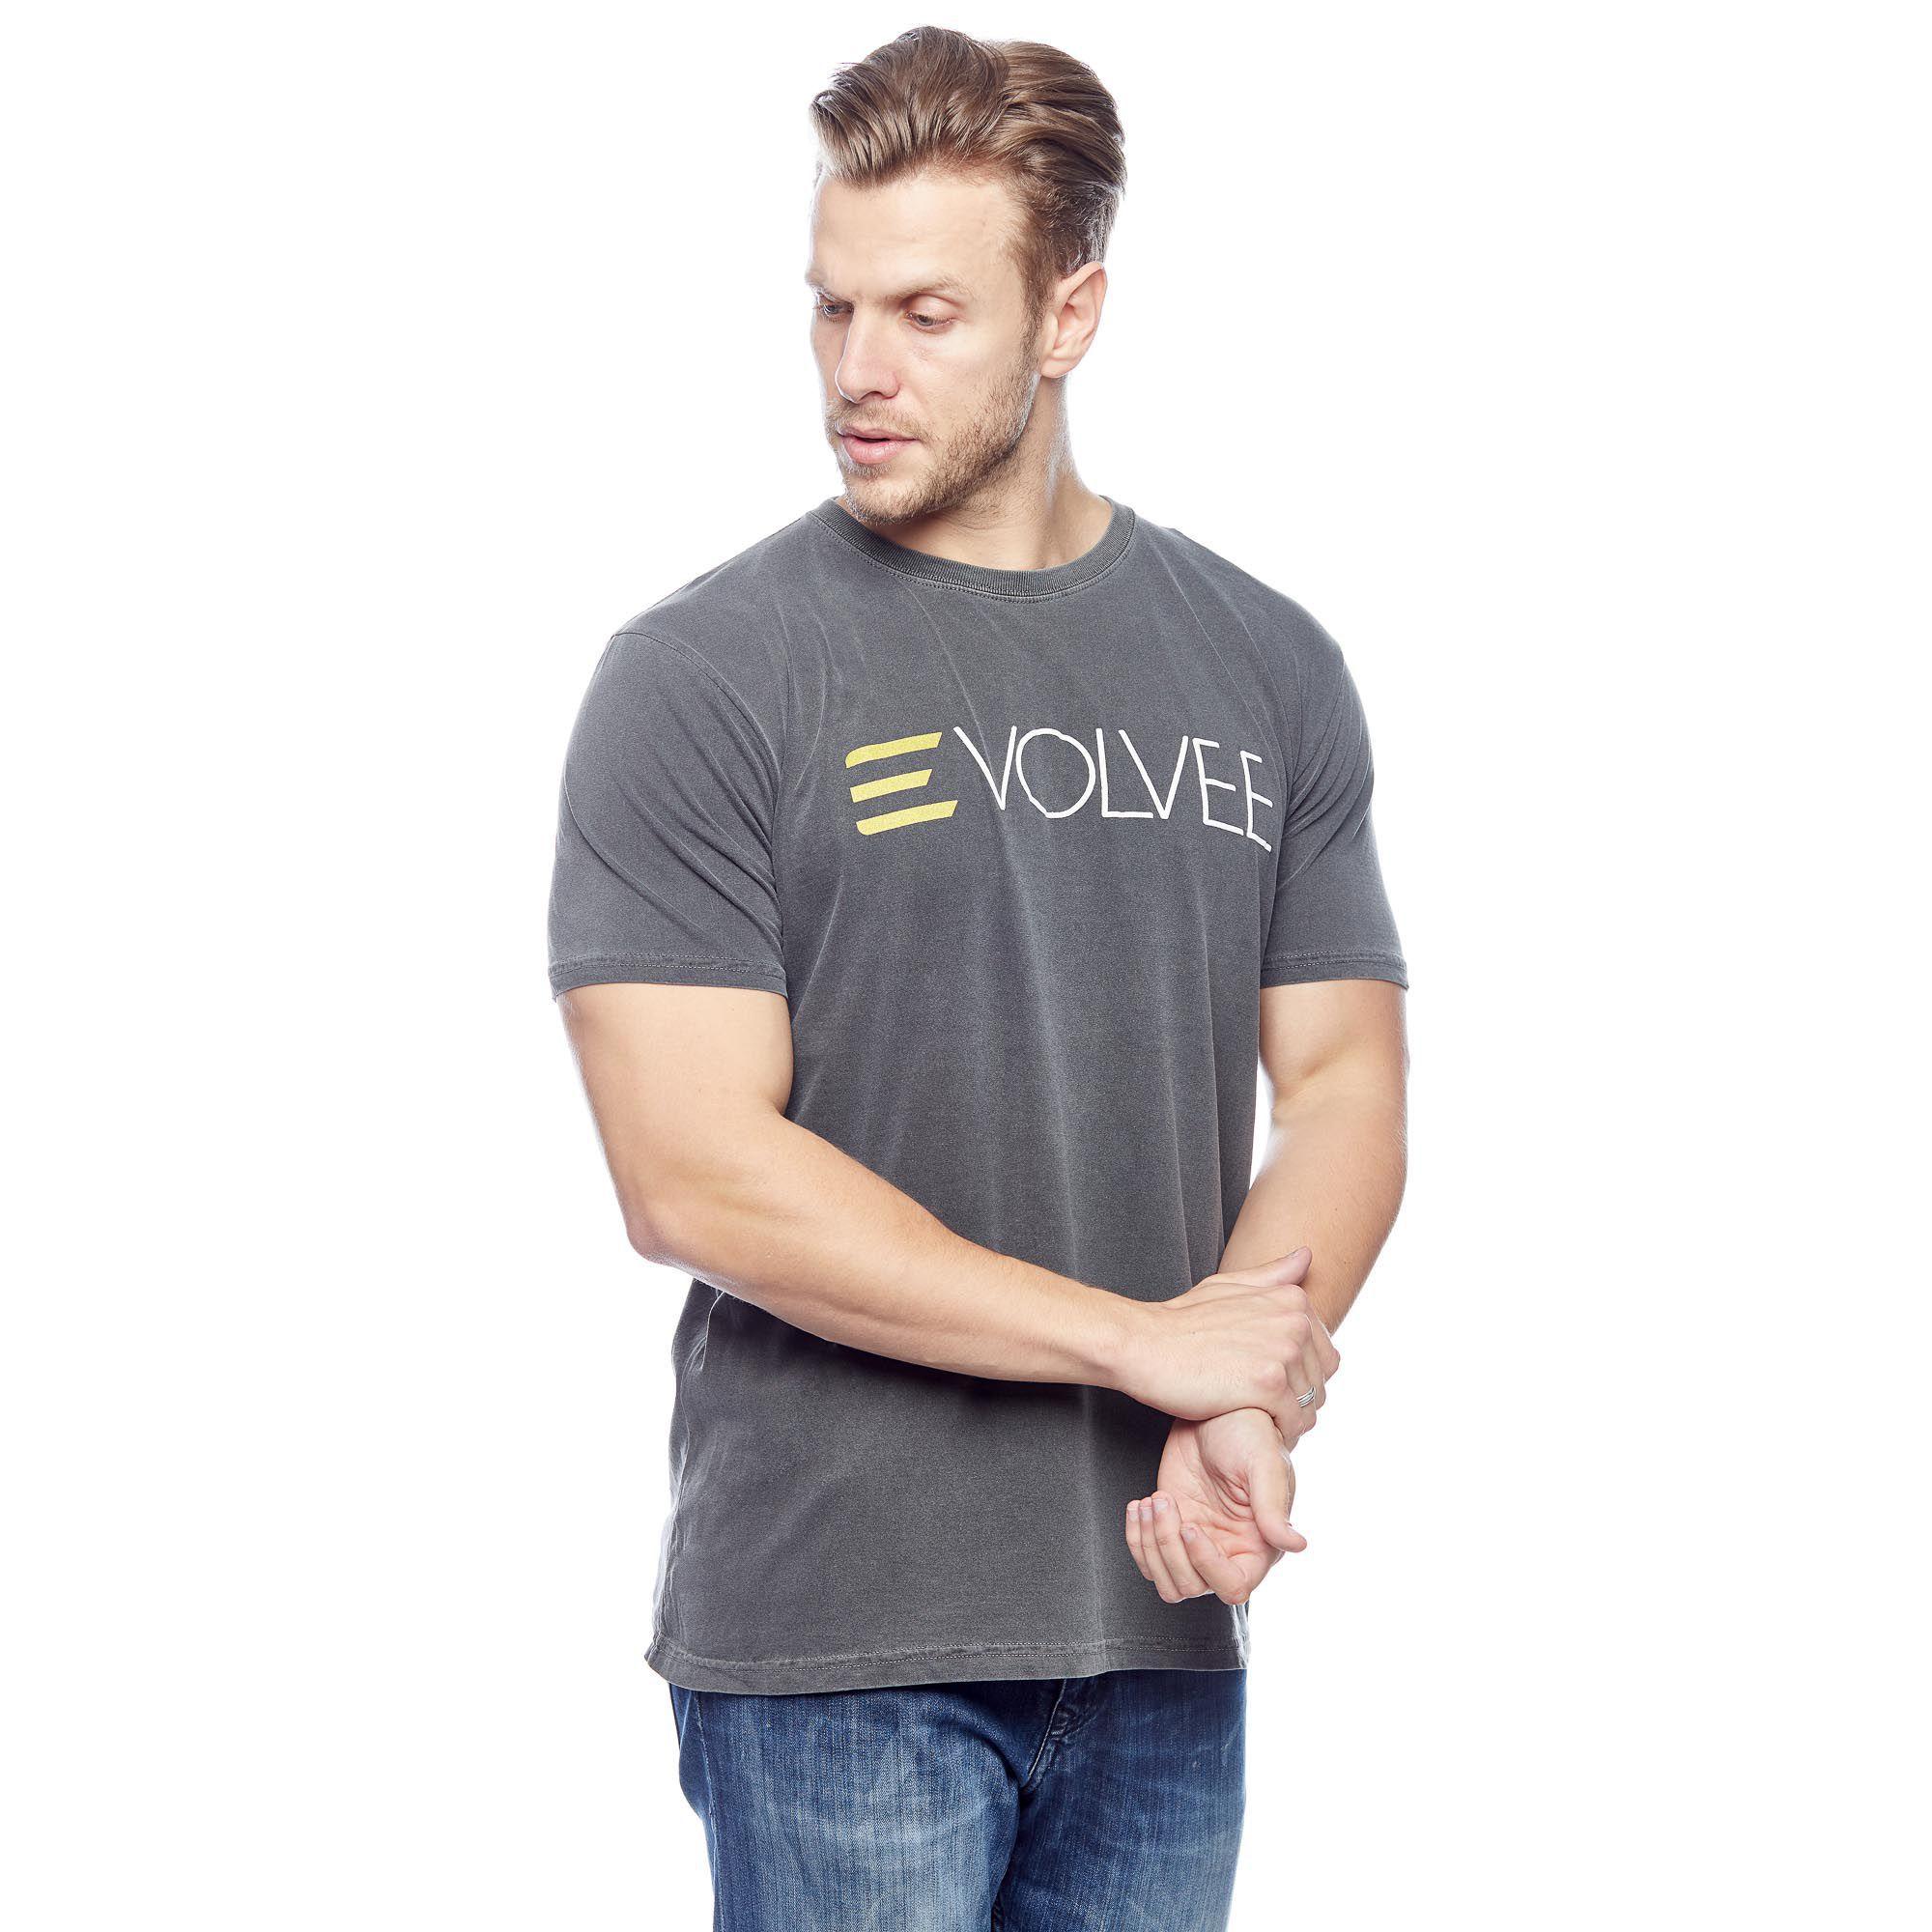 Kit 4 T-Shirts Evolvee Botone